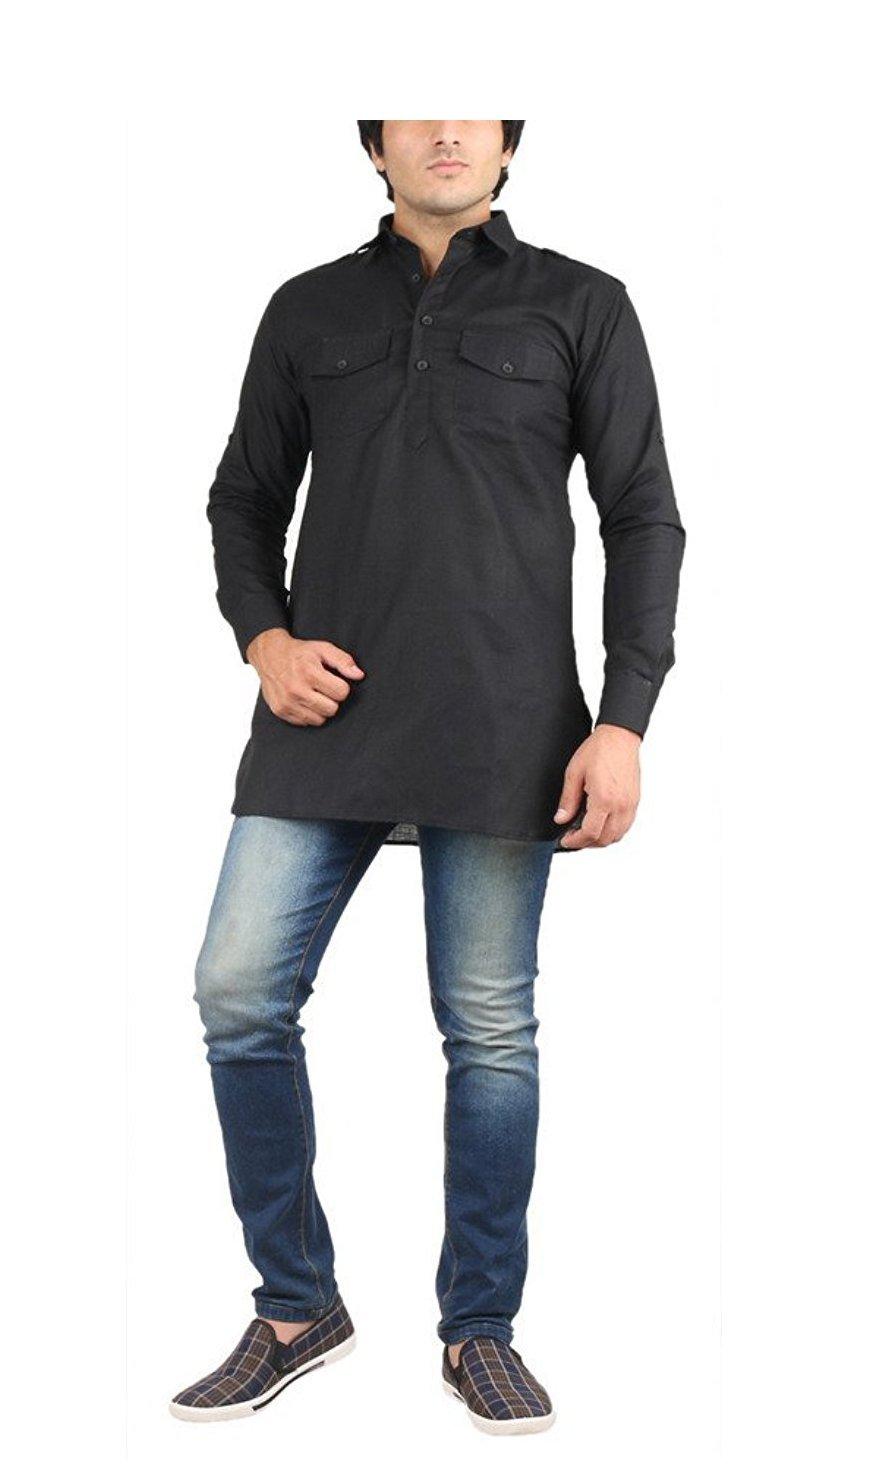 Royal Kurta Men's Fine Cotton Short Pathani Kurta For Denims 38 Black